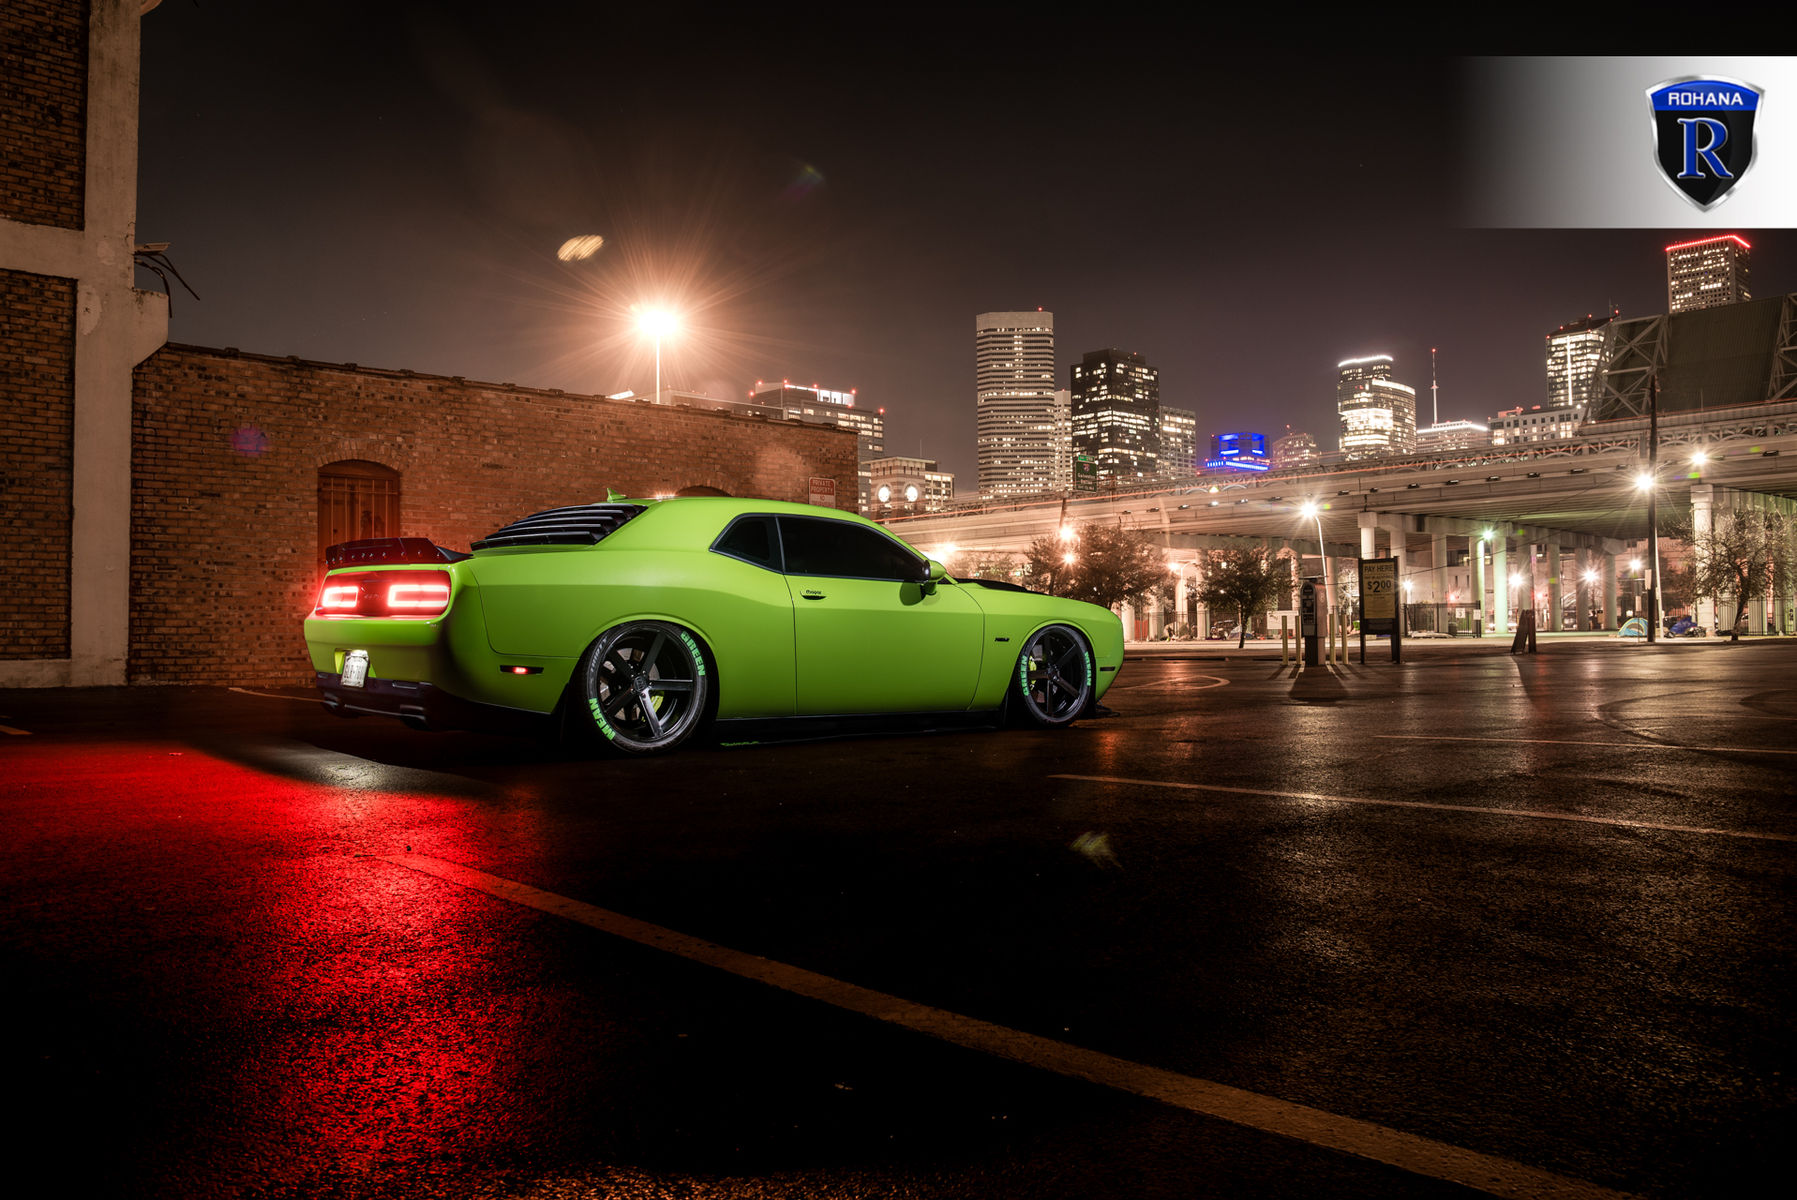 2015 Dodge Challenger | Dodge Challenger RT